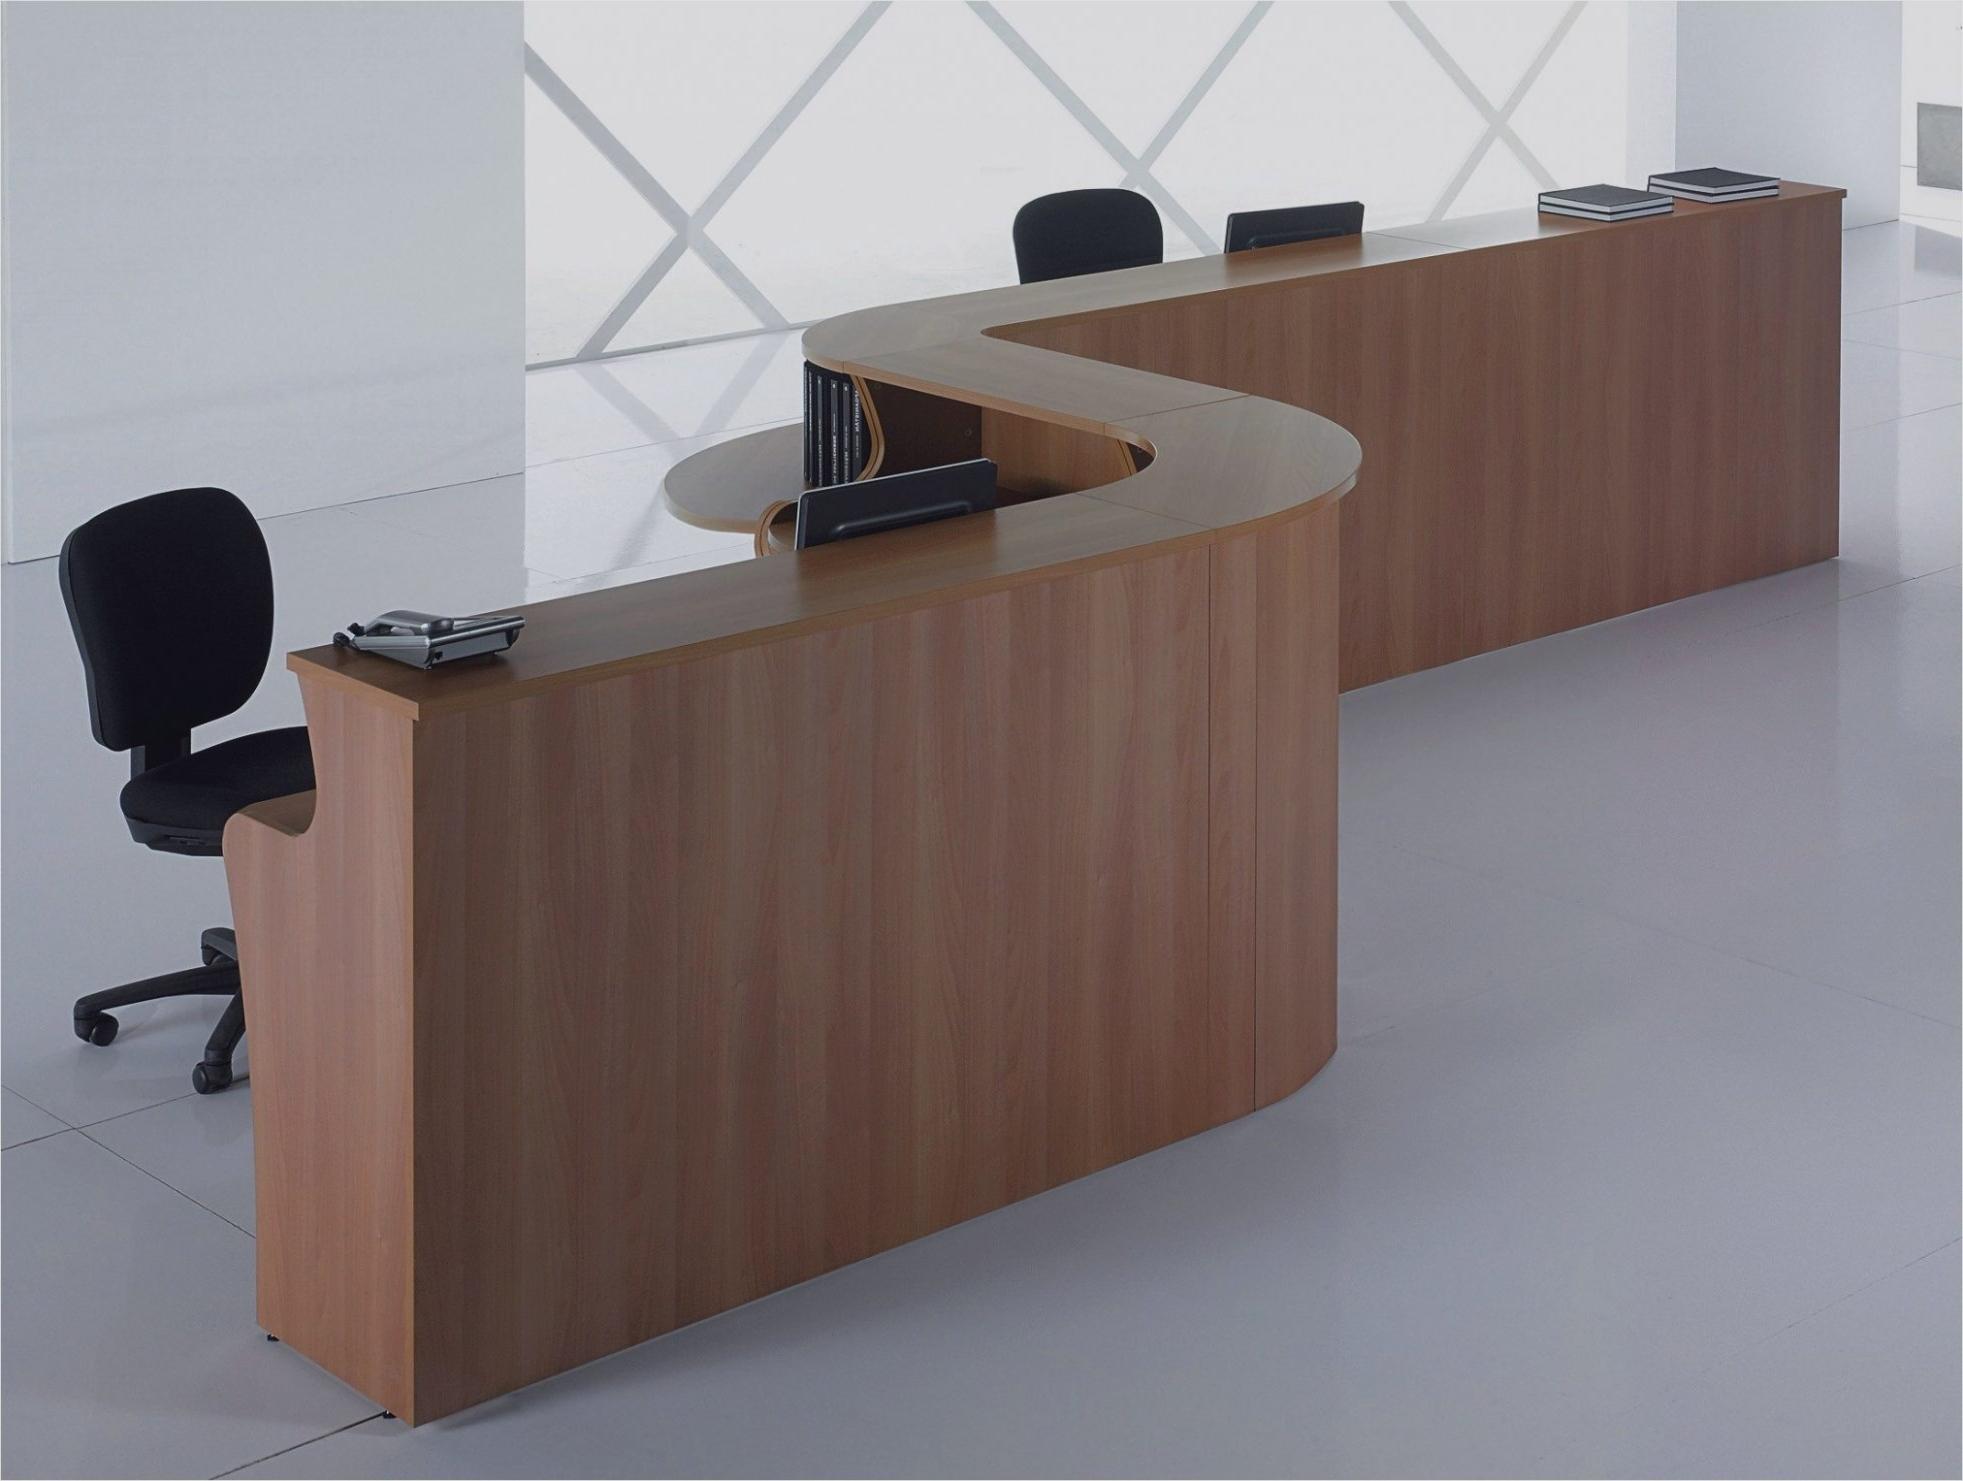 Mobiliario De Oficina Segunda Mano D0dg Mobiliario Oficina Segunda Mano Famoso Muebles Icina